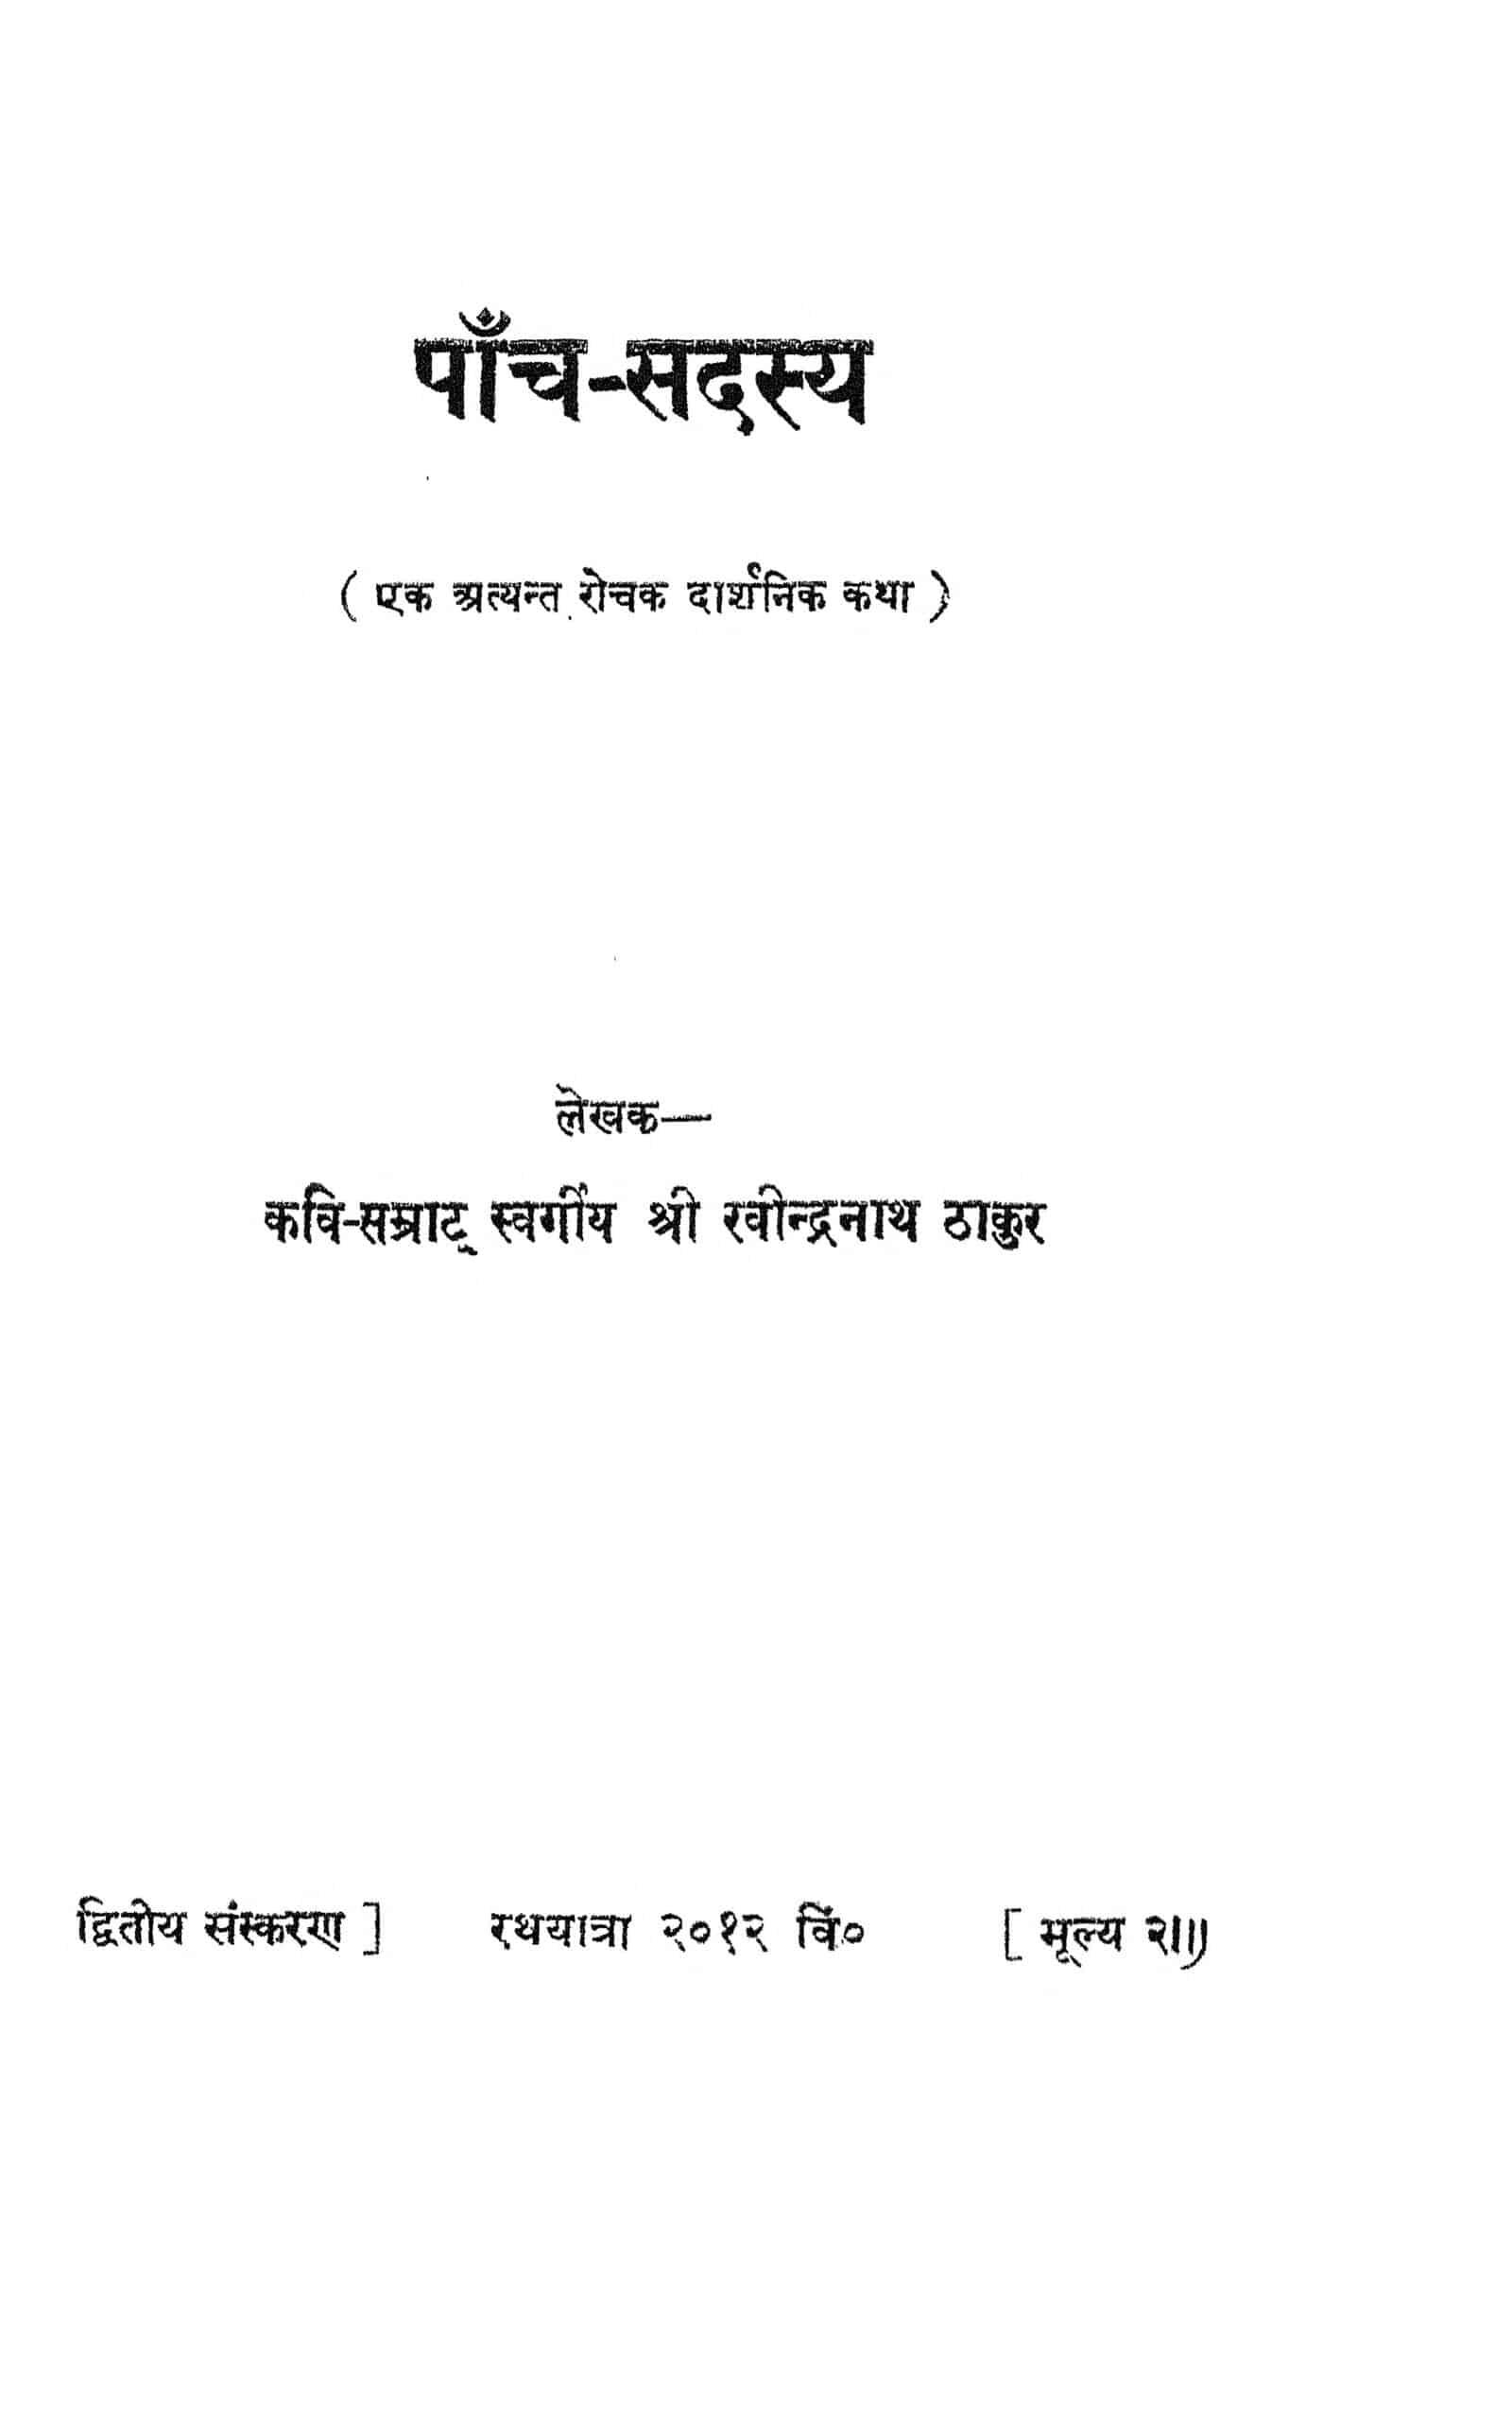 Panch-sadasya by रवीन्द्रनाथ ठाकुर - Ravindranath Thakur